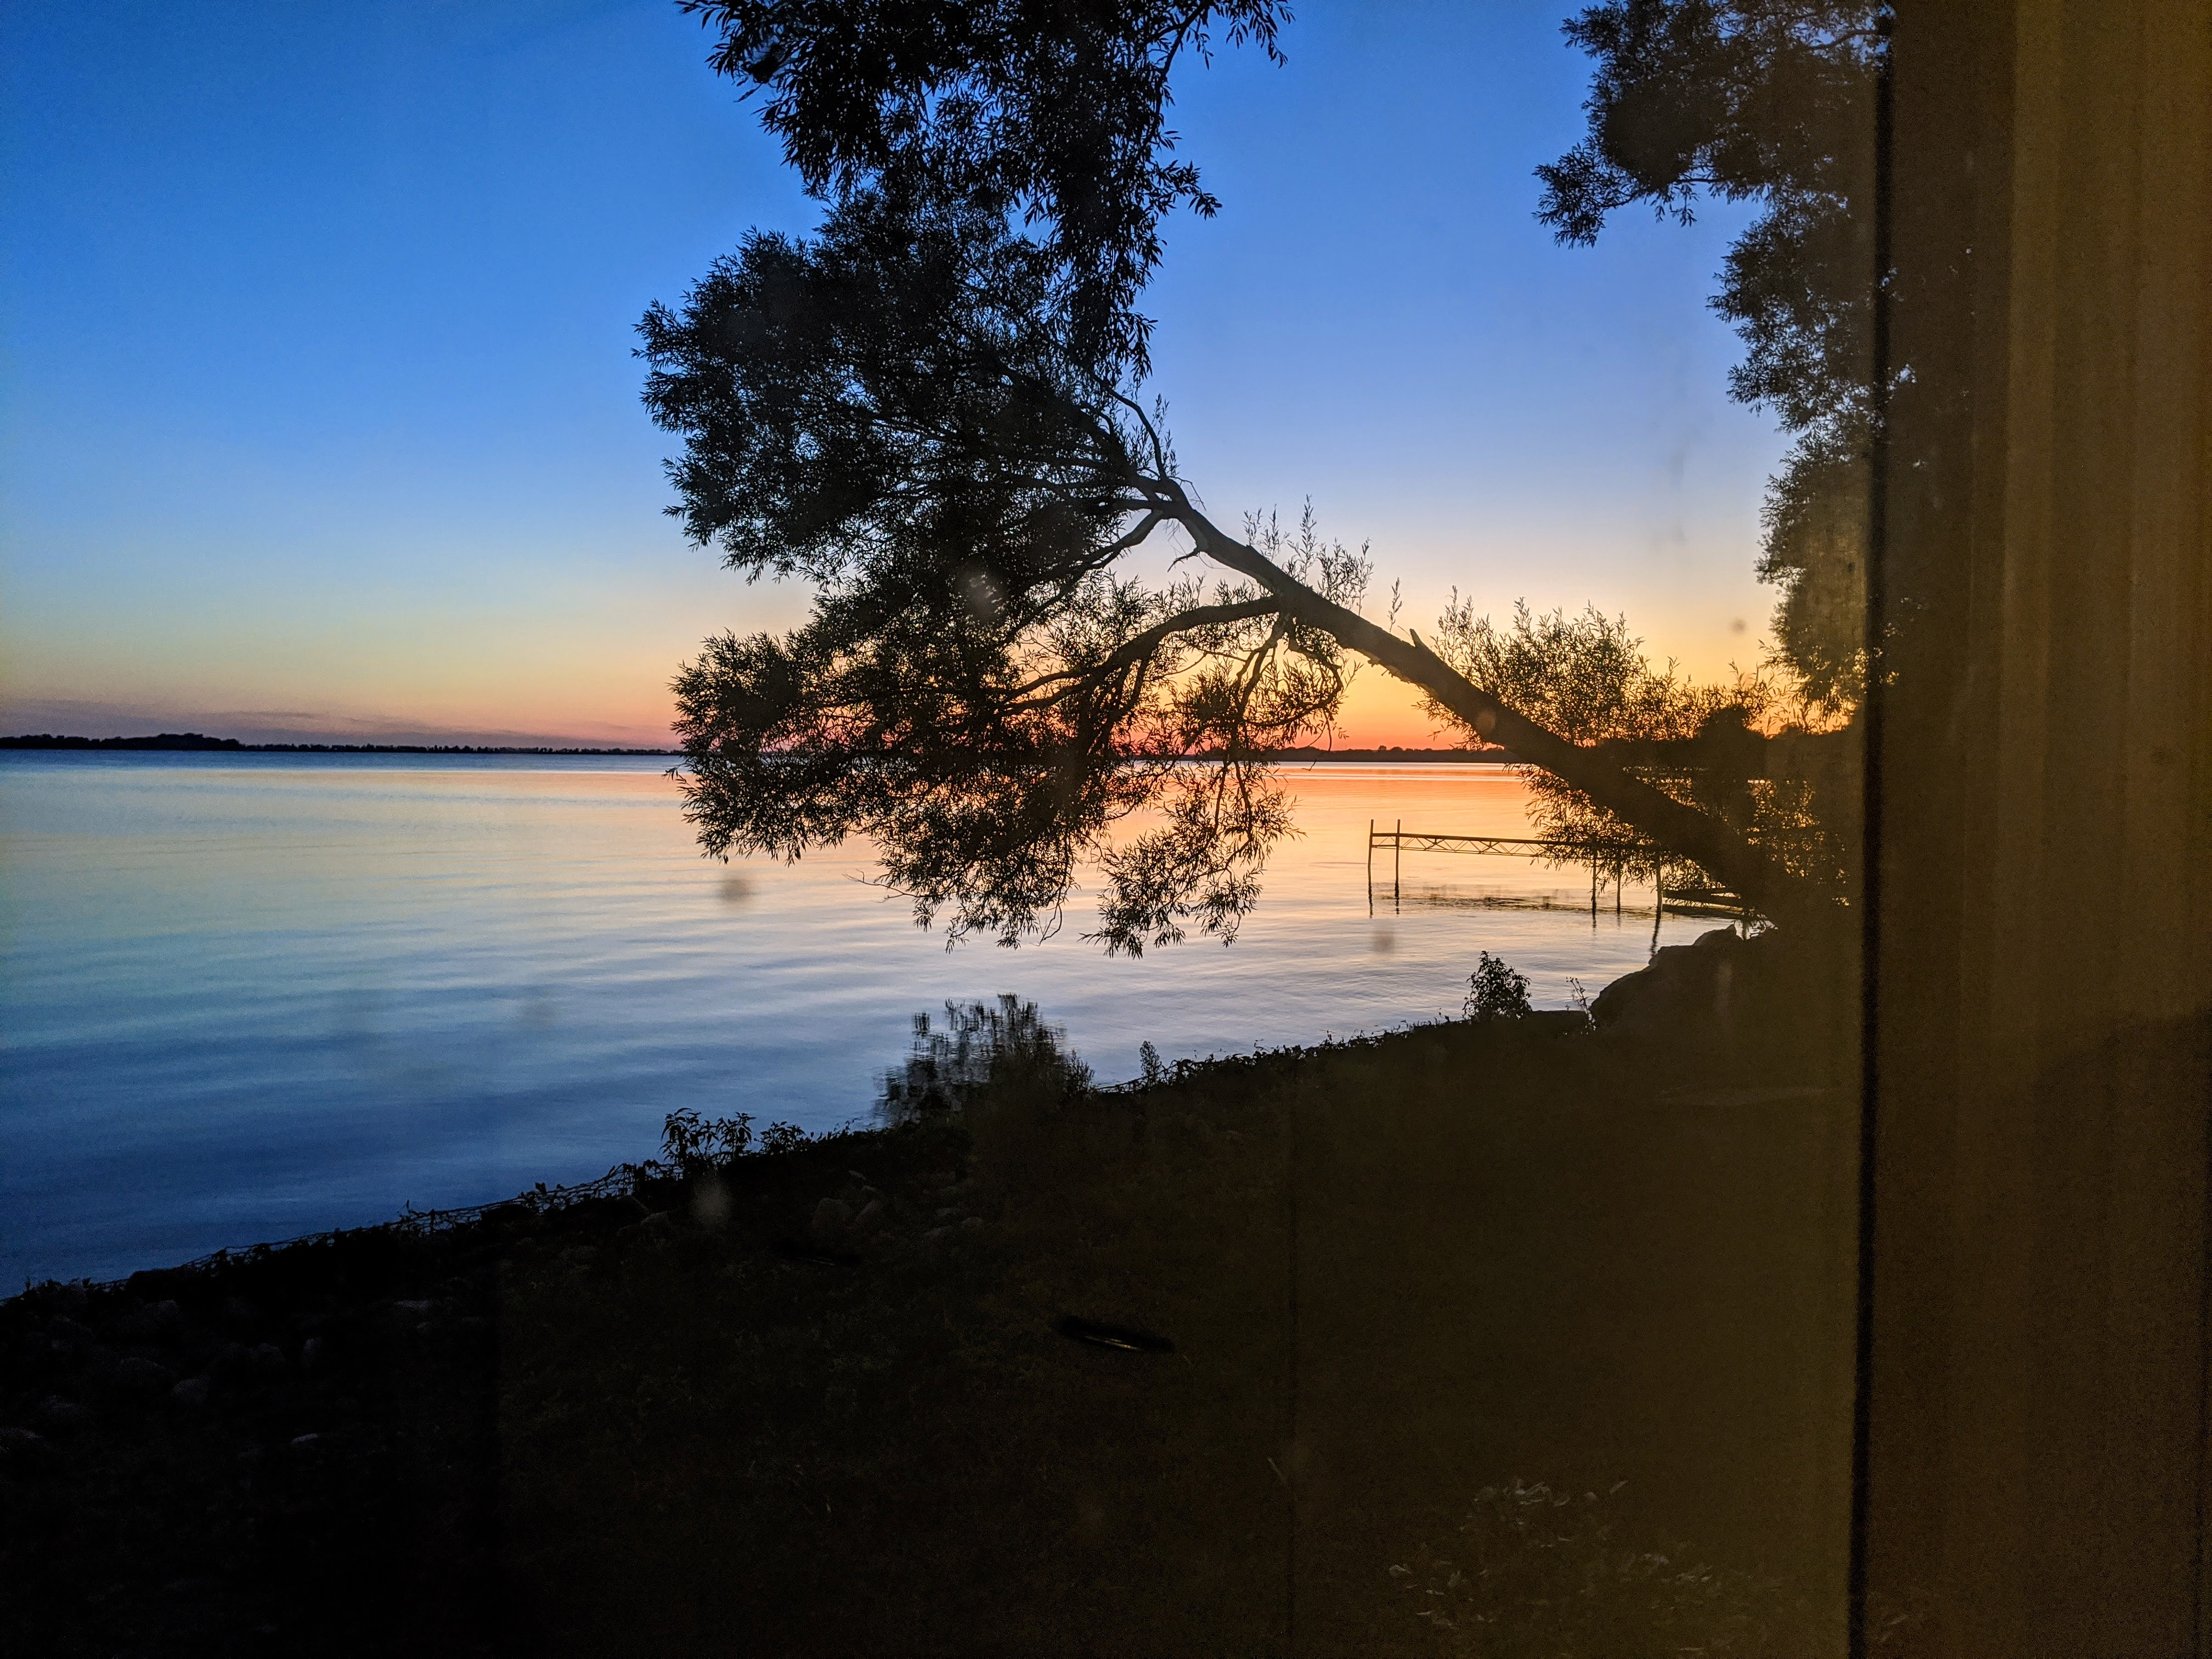 Consecon Lake